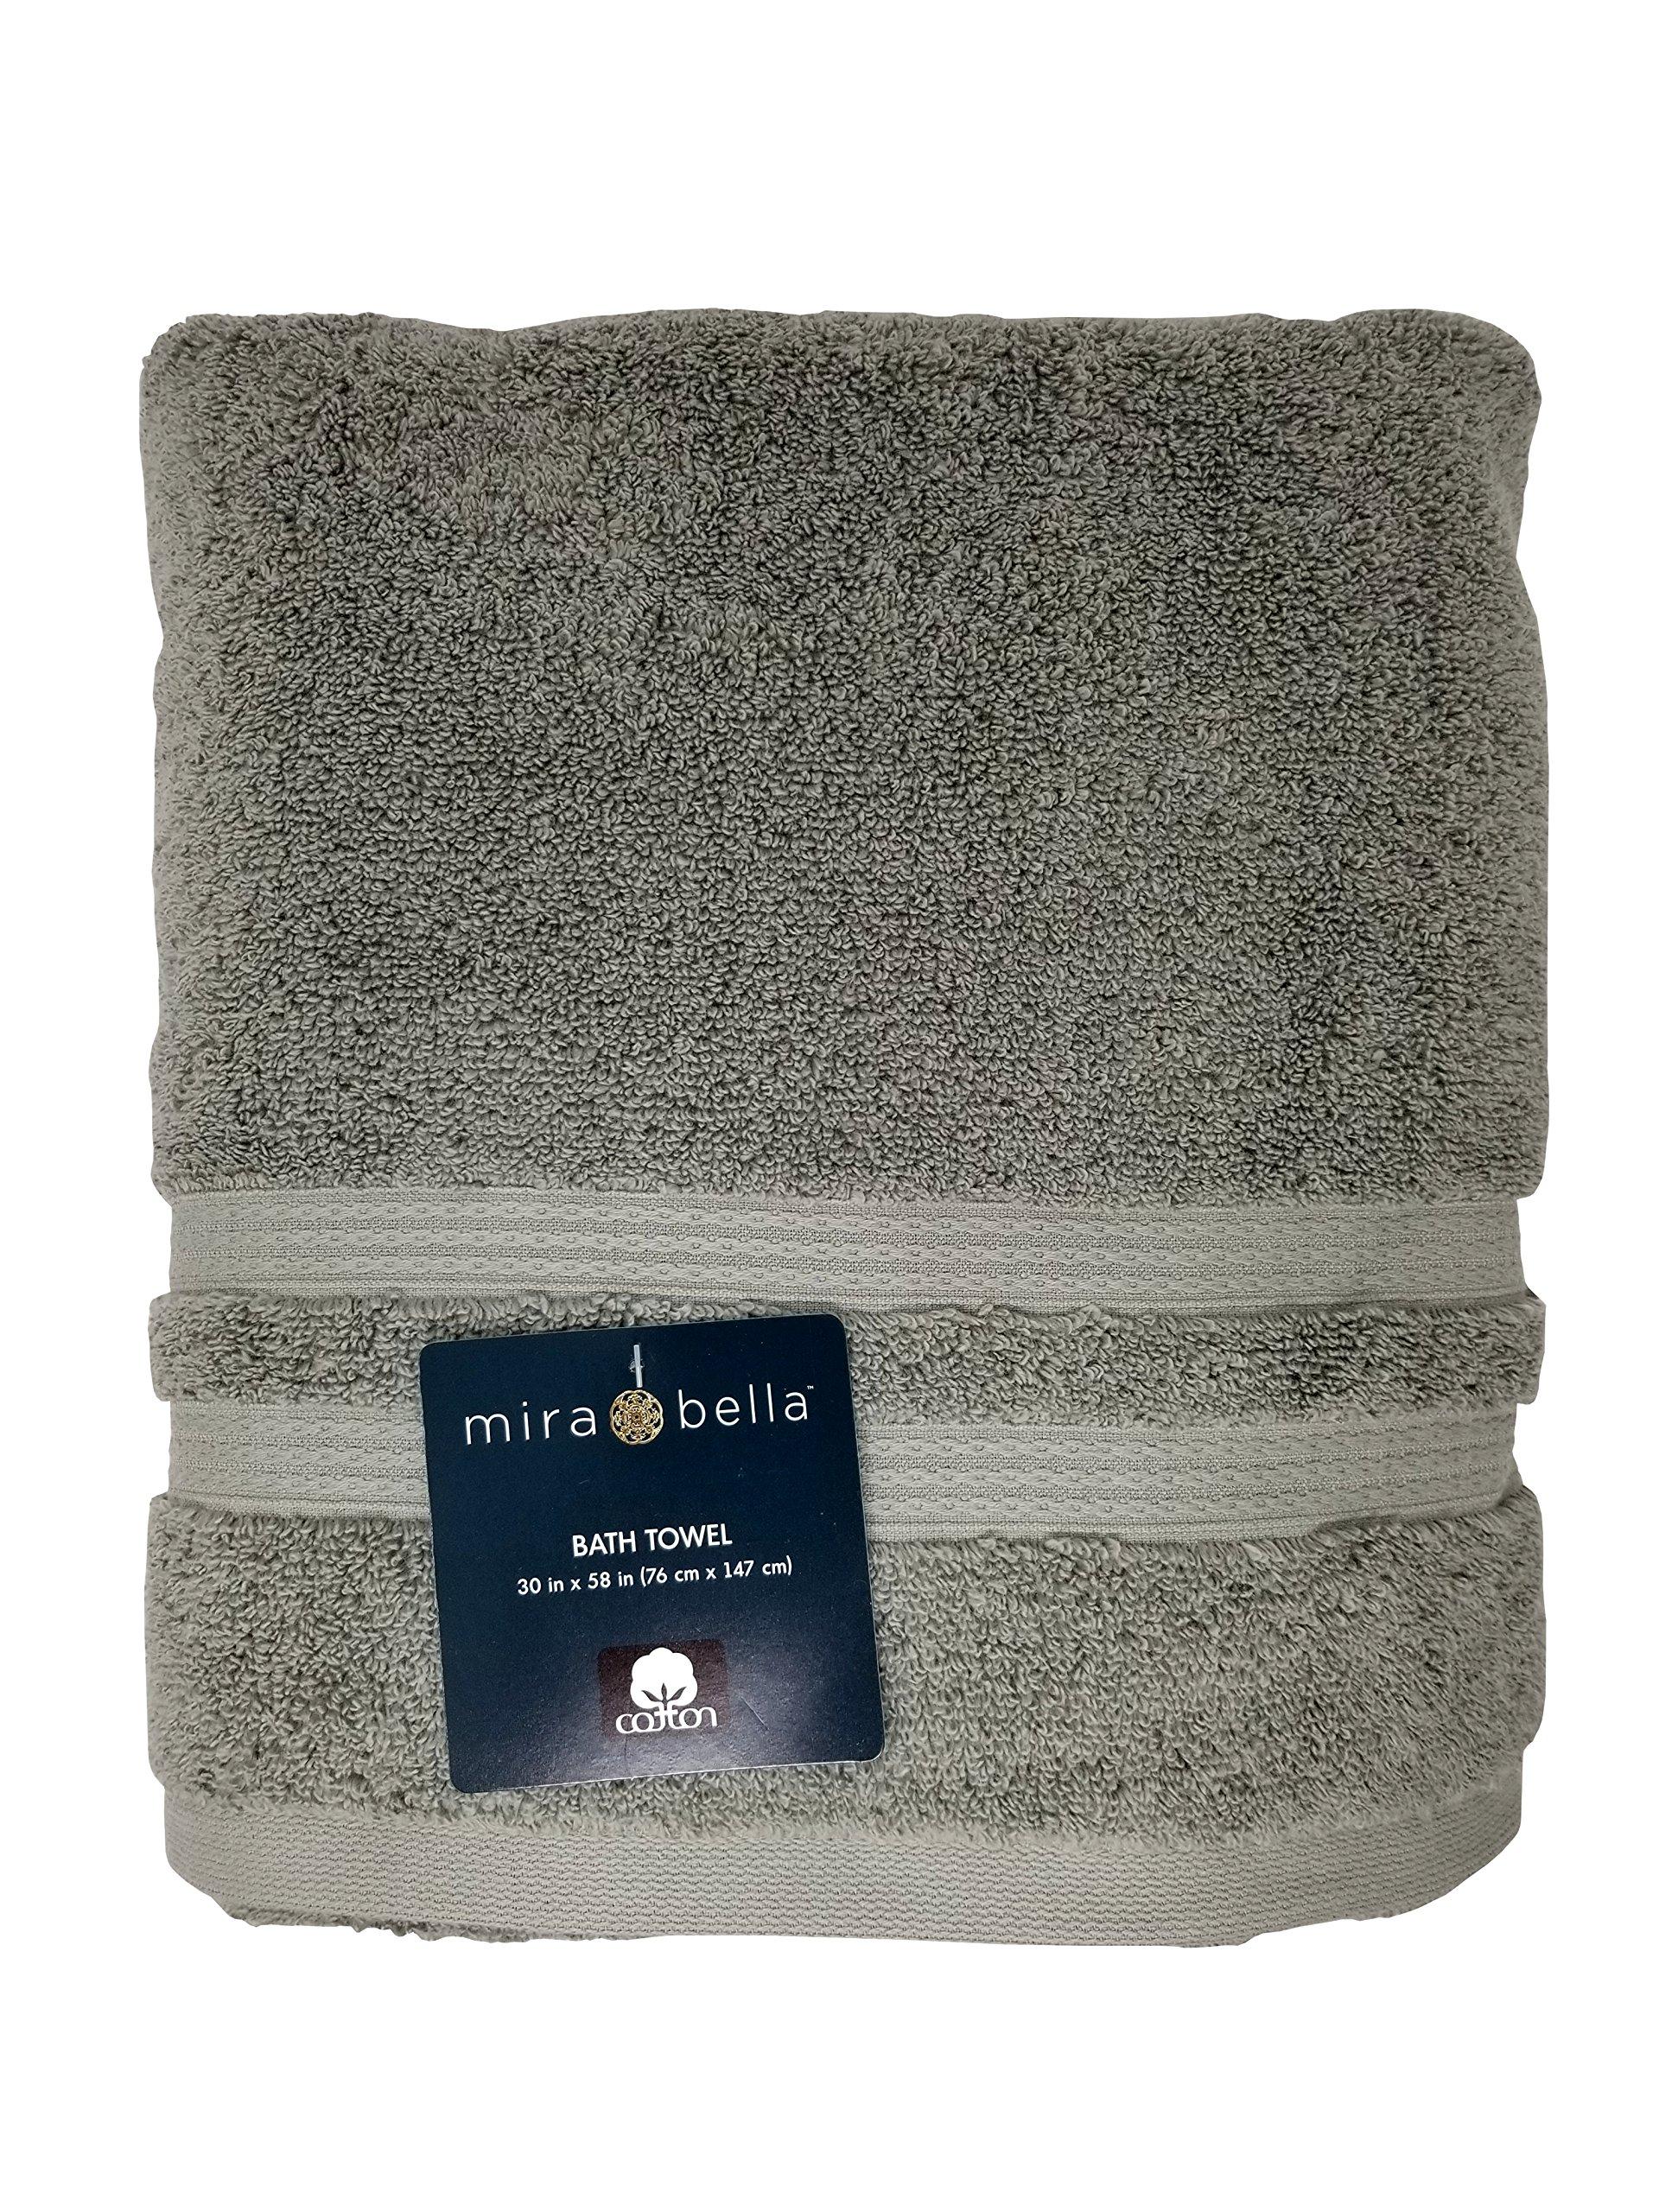 Mira Bella Cotton Bath Towel 30'' x 58'' Made in India - Grey